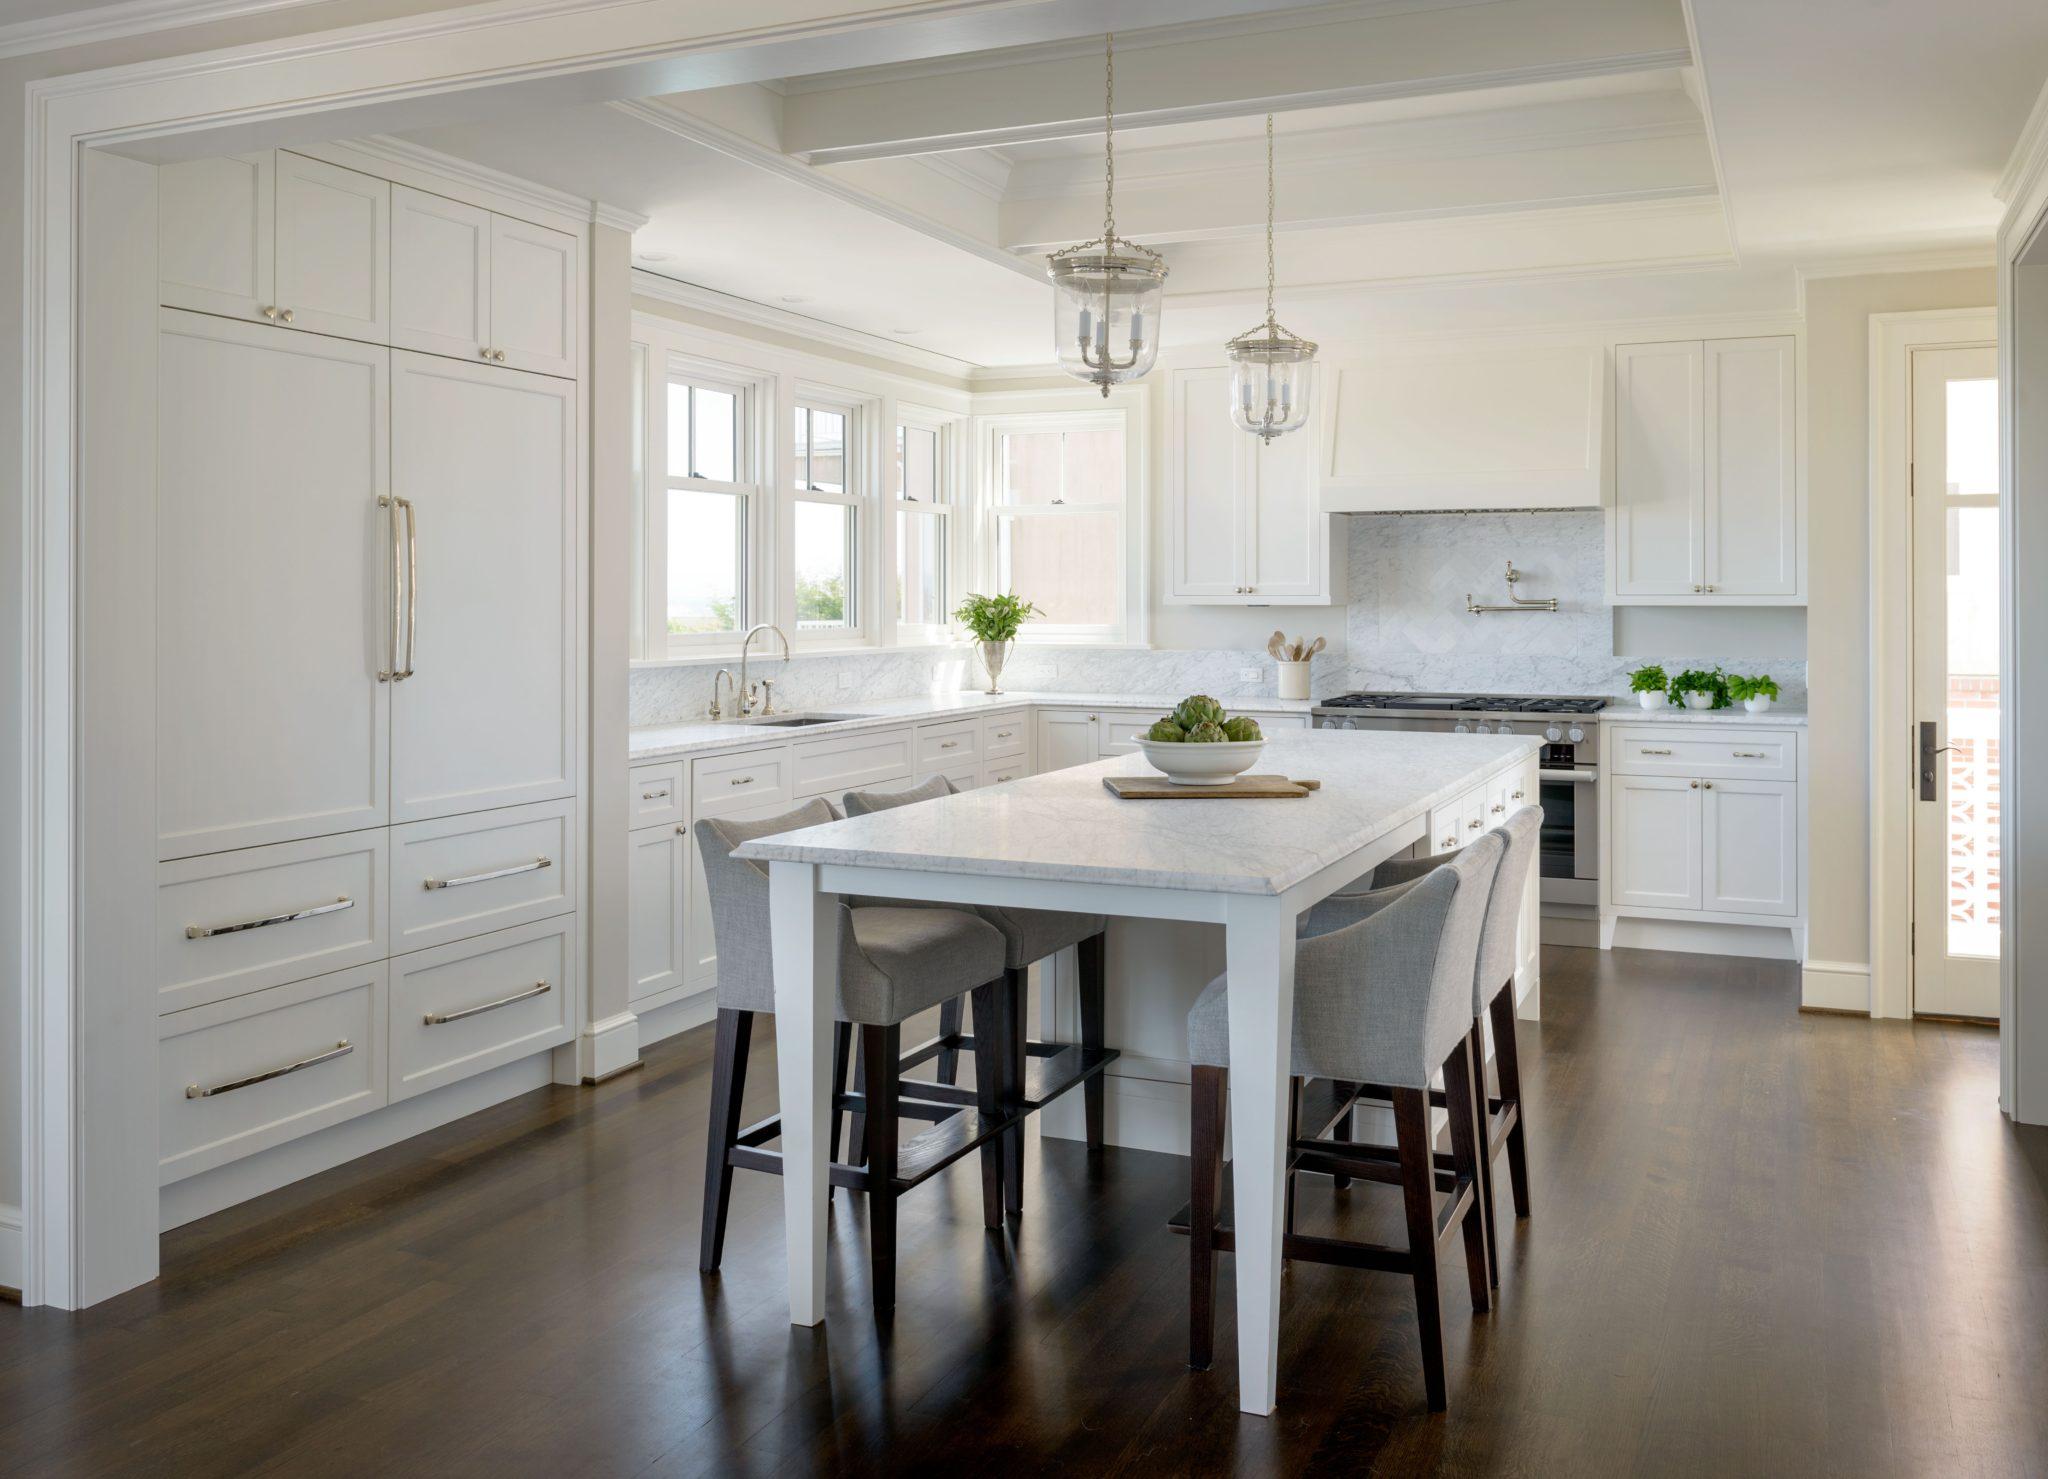 Charming kitchen design by Marianne Simon Design